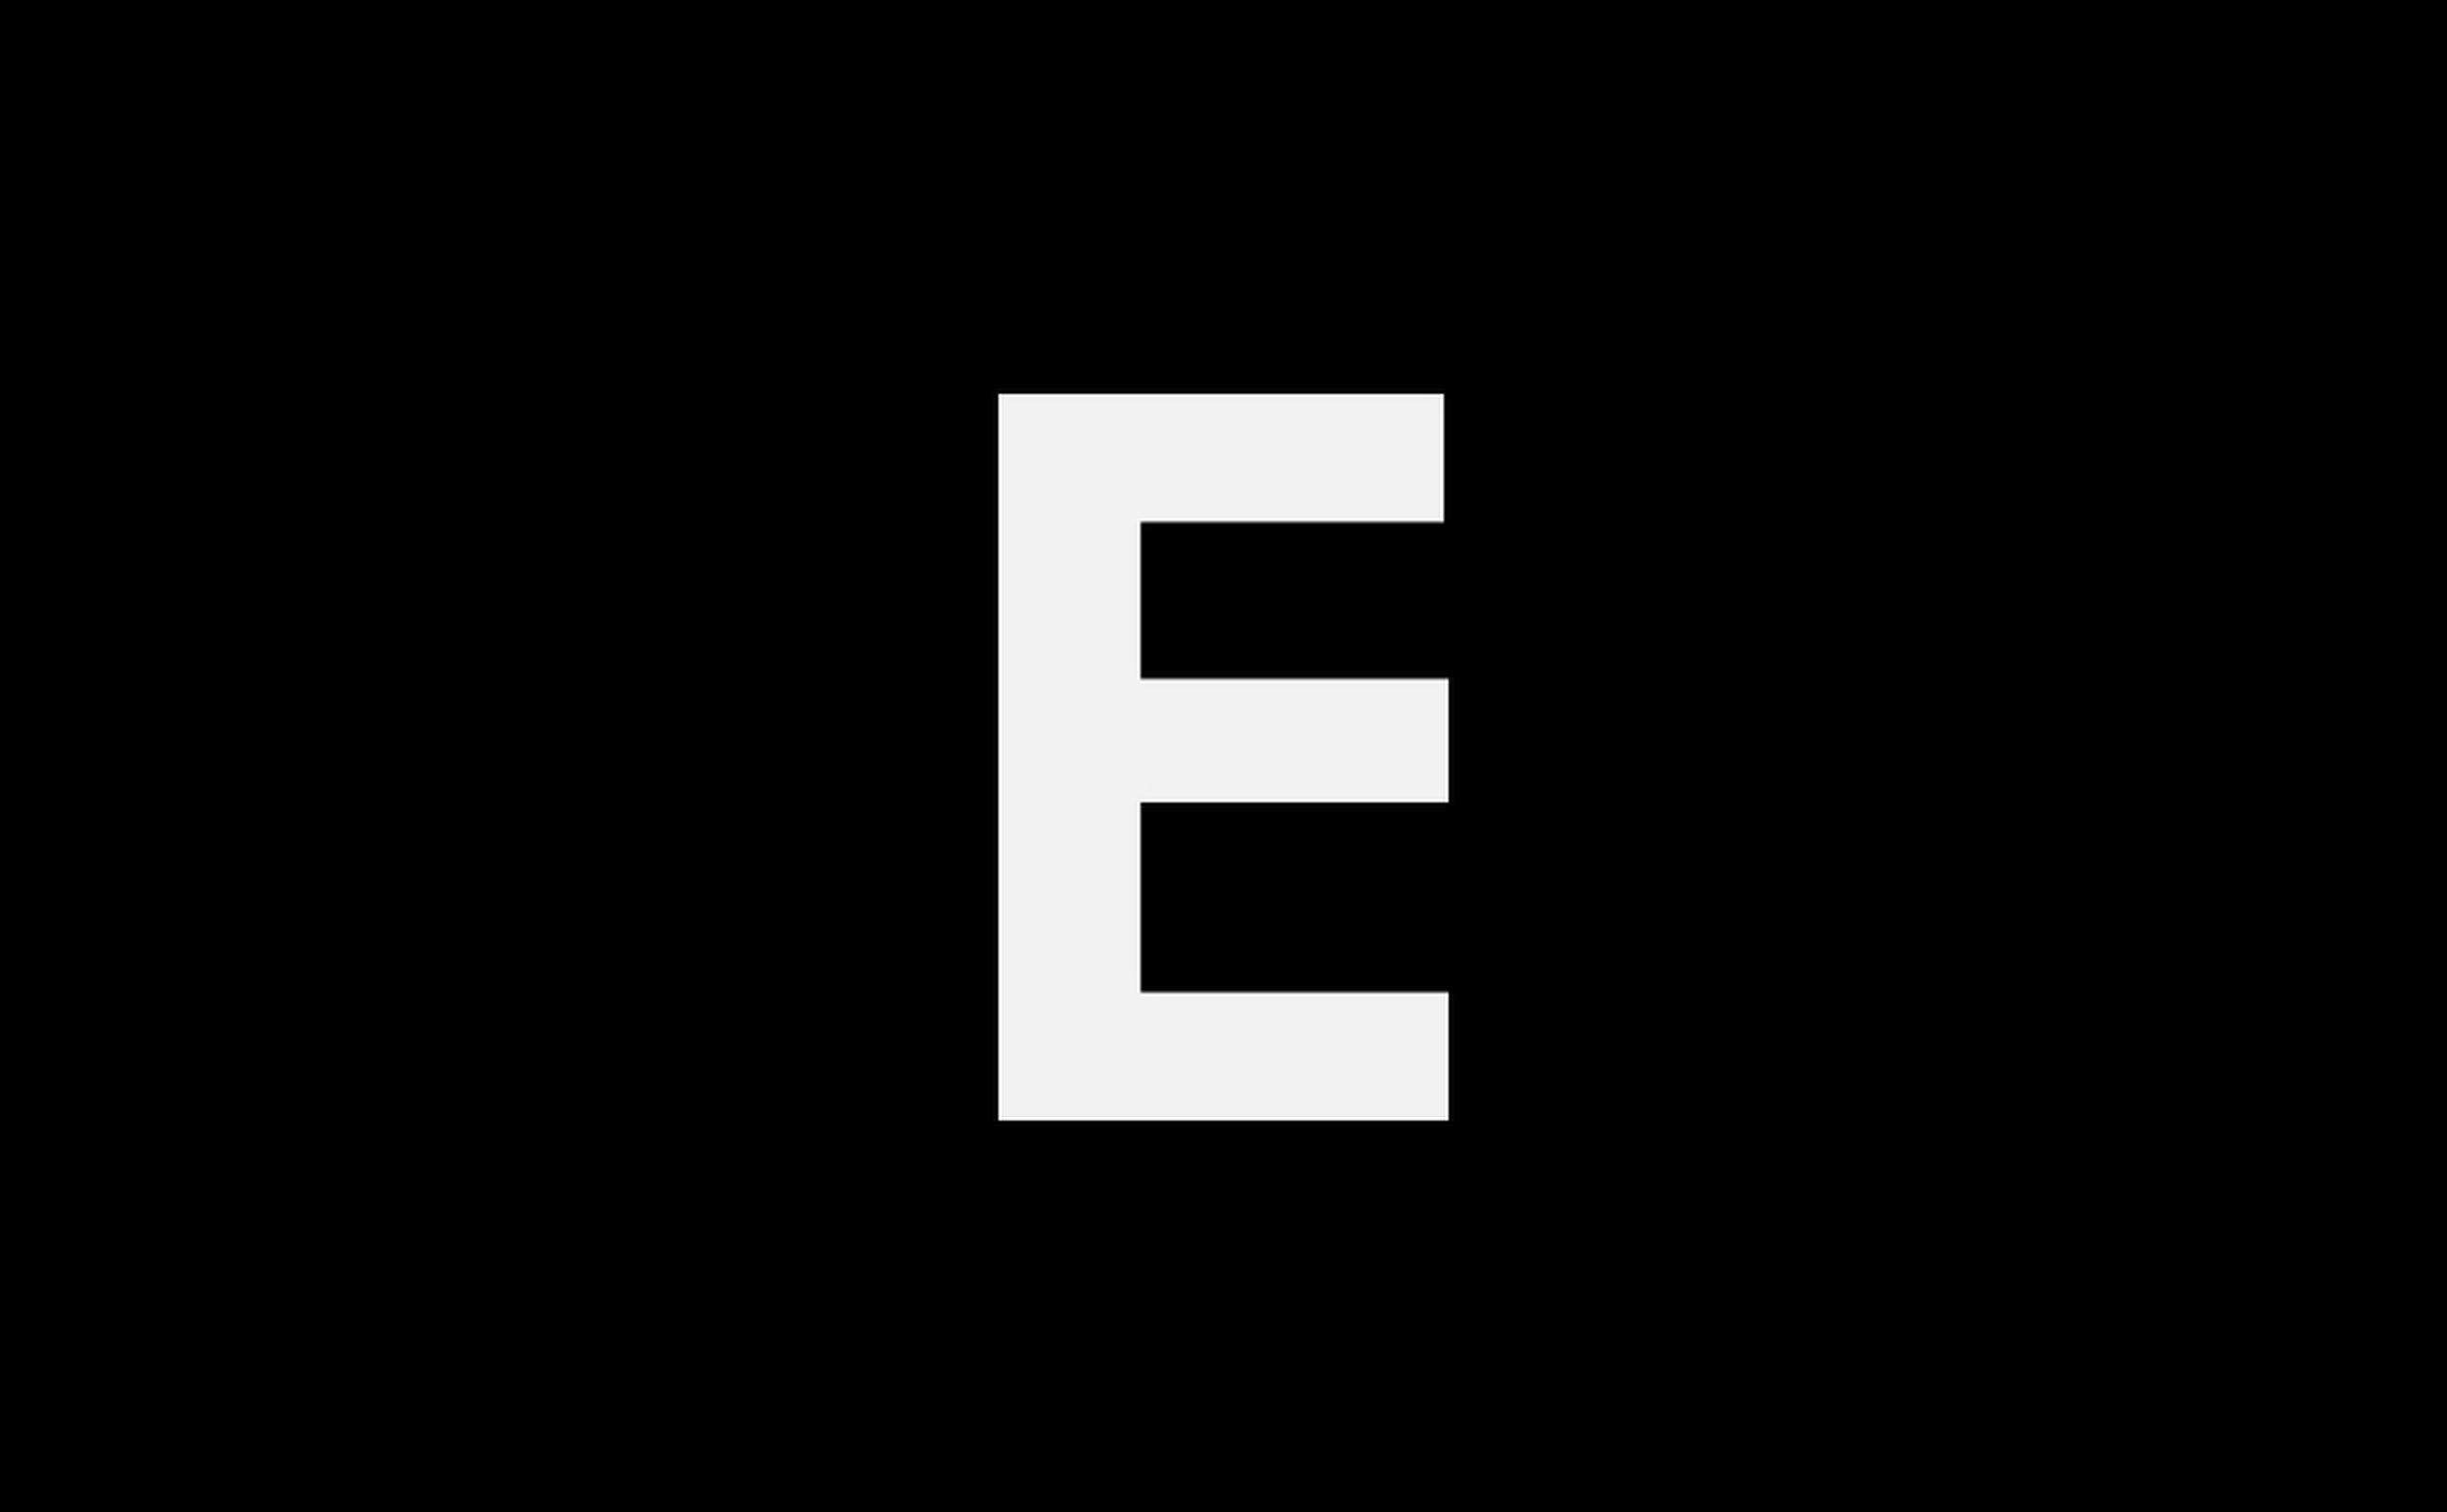 CLOSE-UP OF BIRD ON BRICK WALL